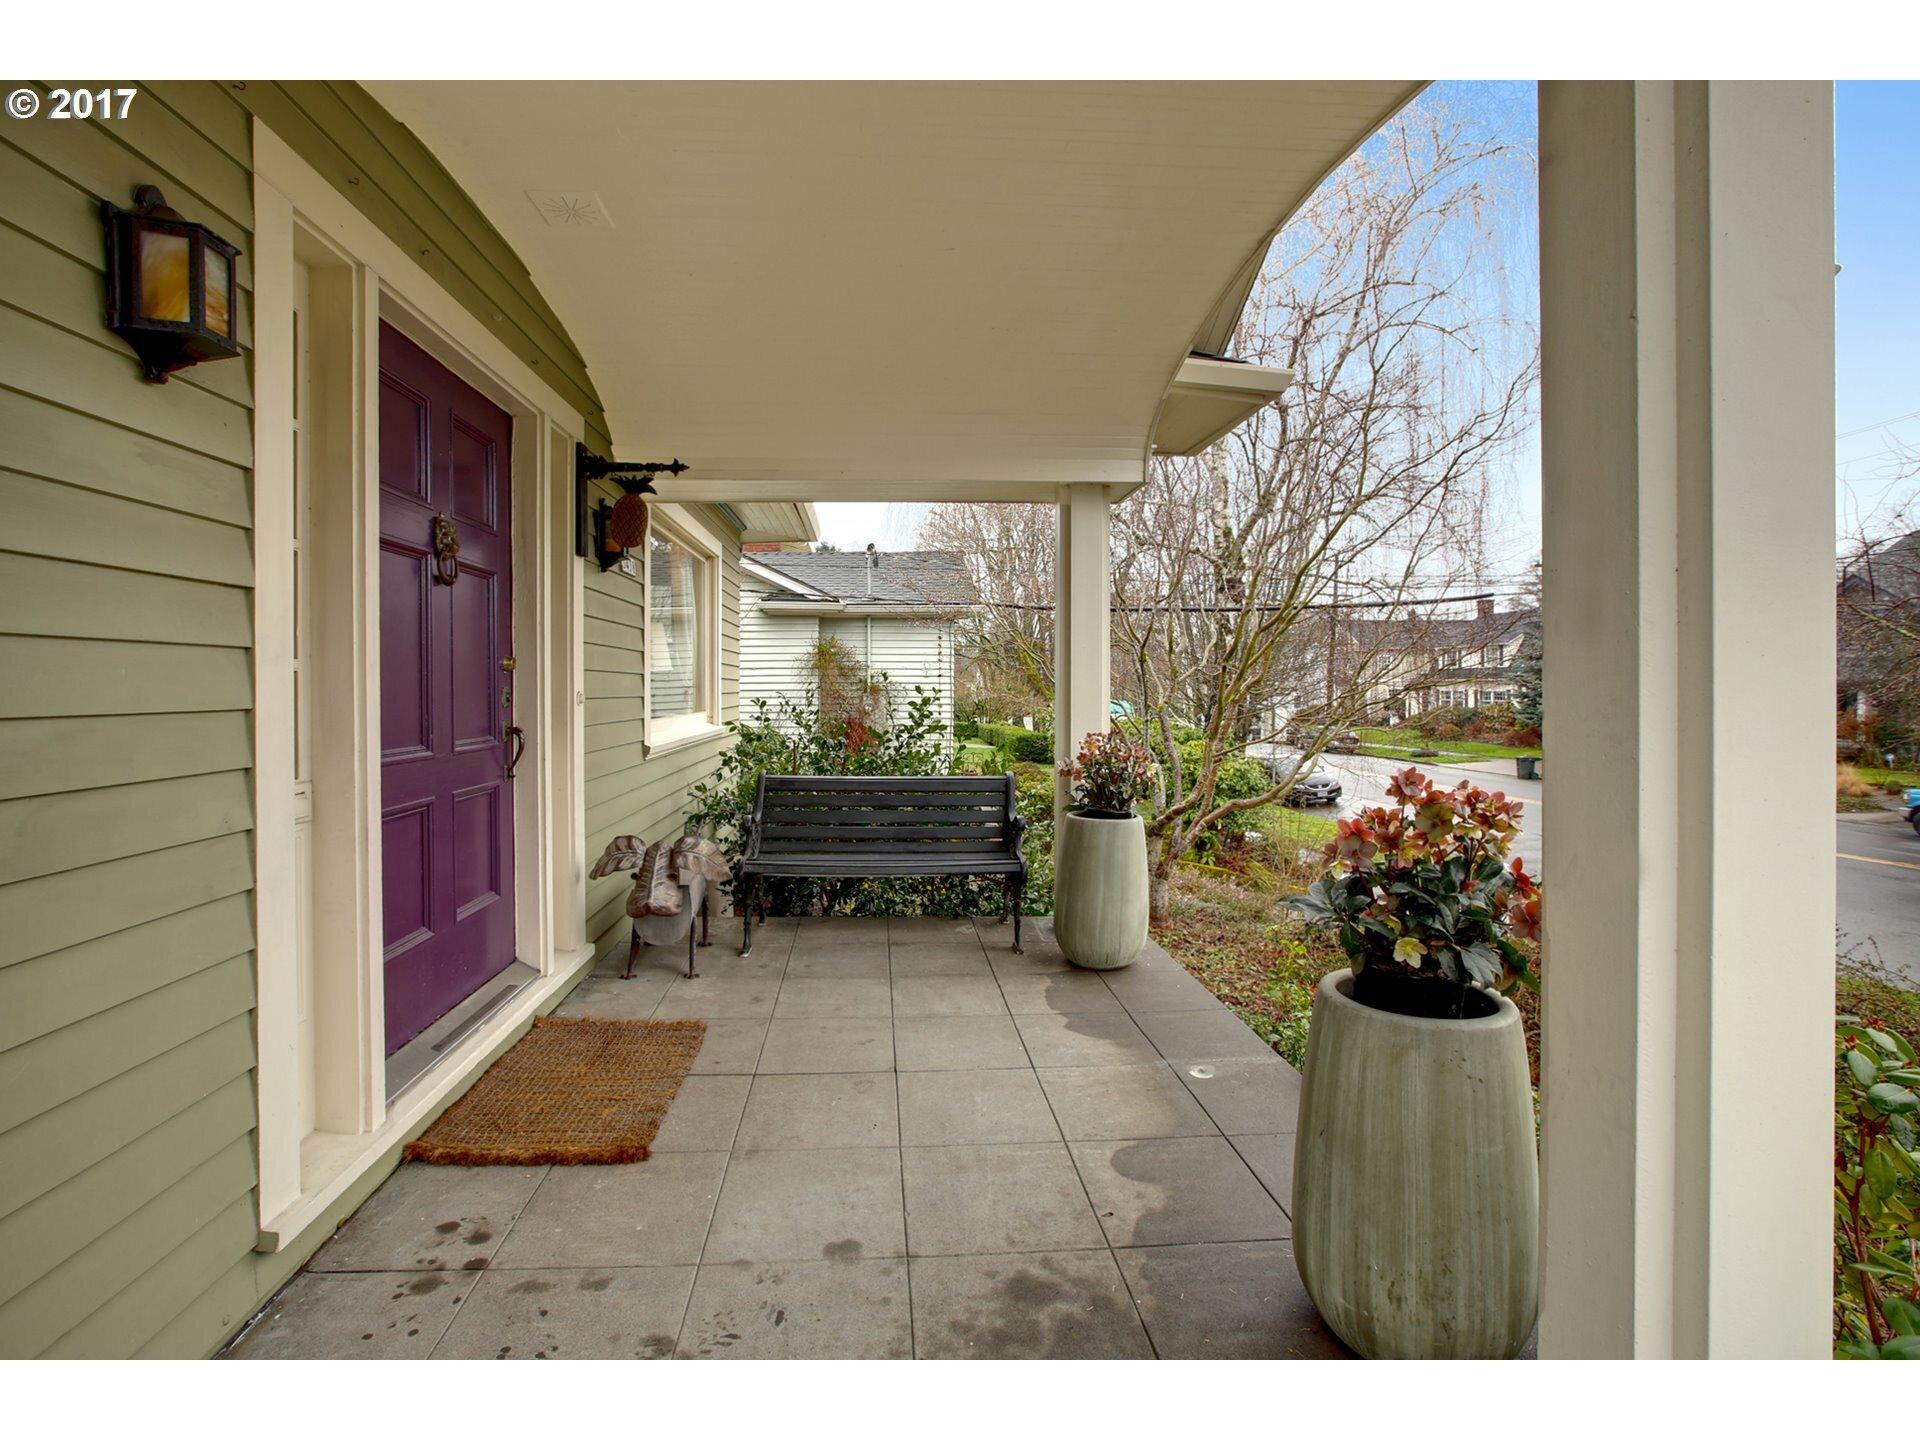 3438 Ne Hassalo St, Portland, OR - USA (photo 3)